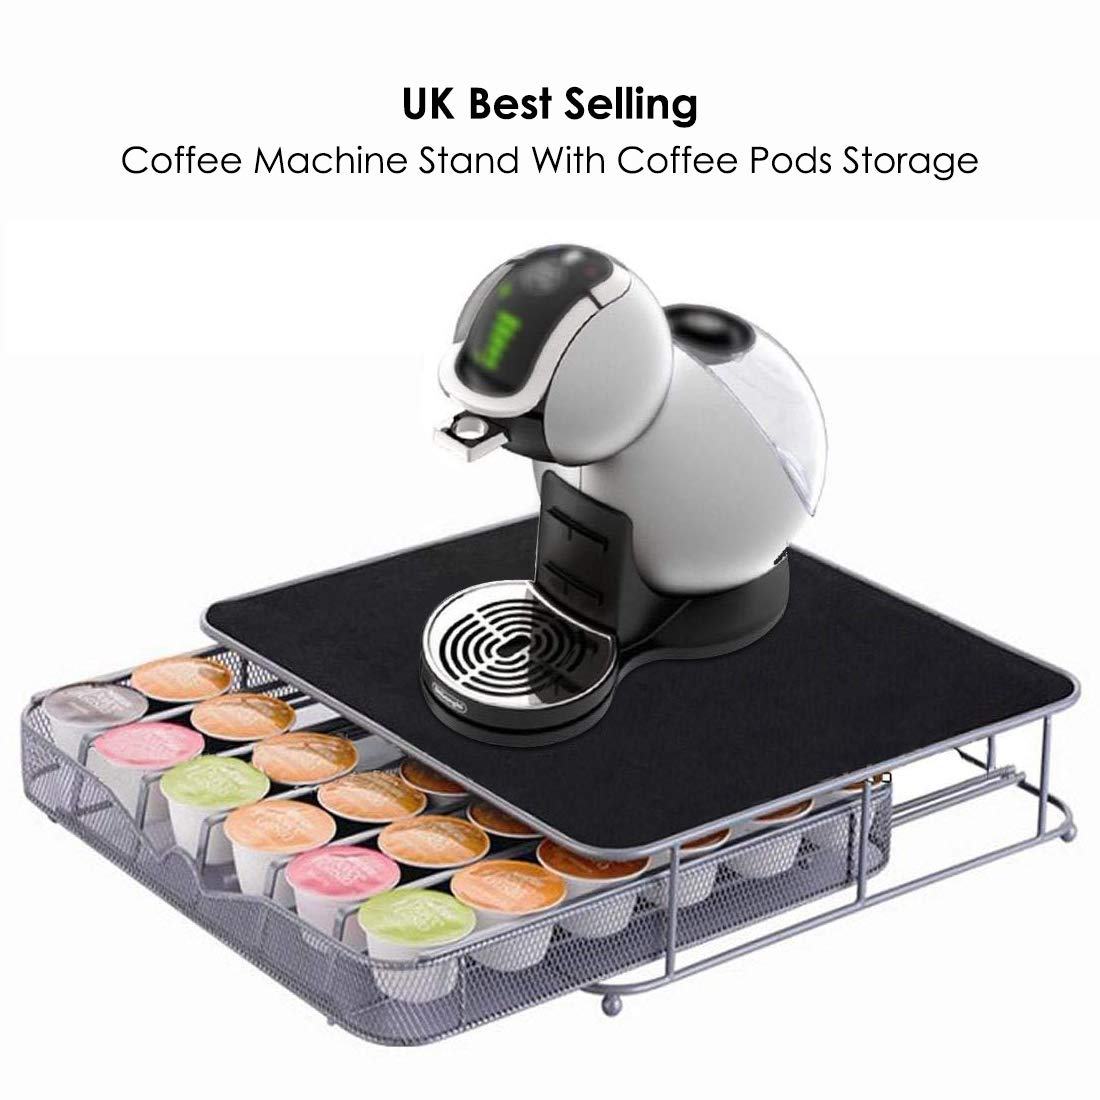 Jjonlinestore- 36 Coffee Pods Dolce Gusto Coffee Capsule Drawer Storage: Amazon.es: Hogar